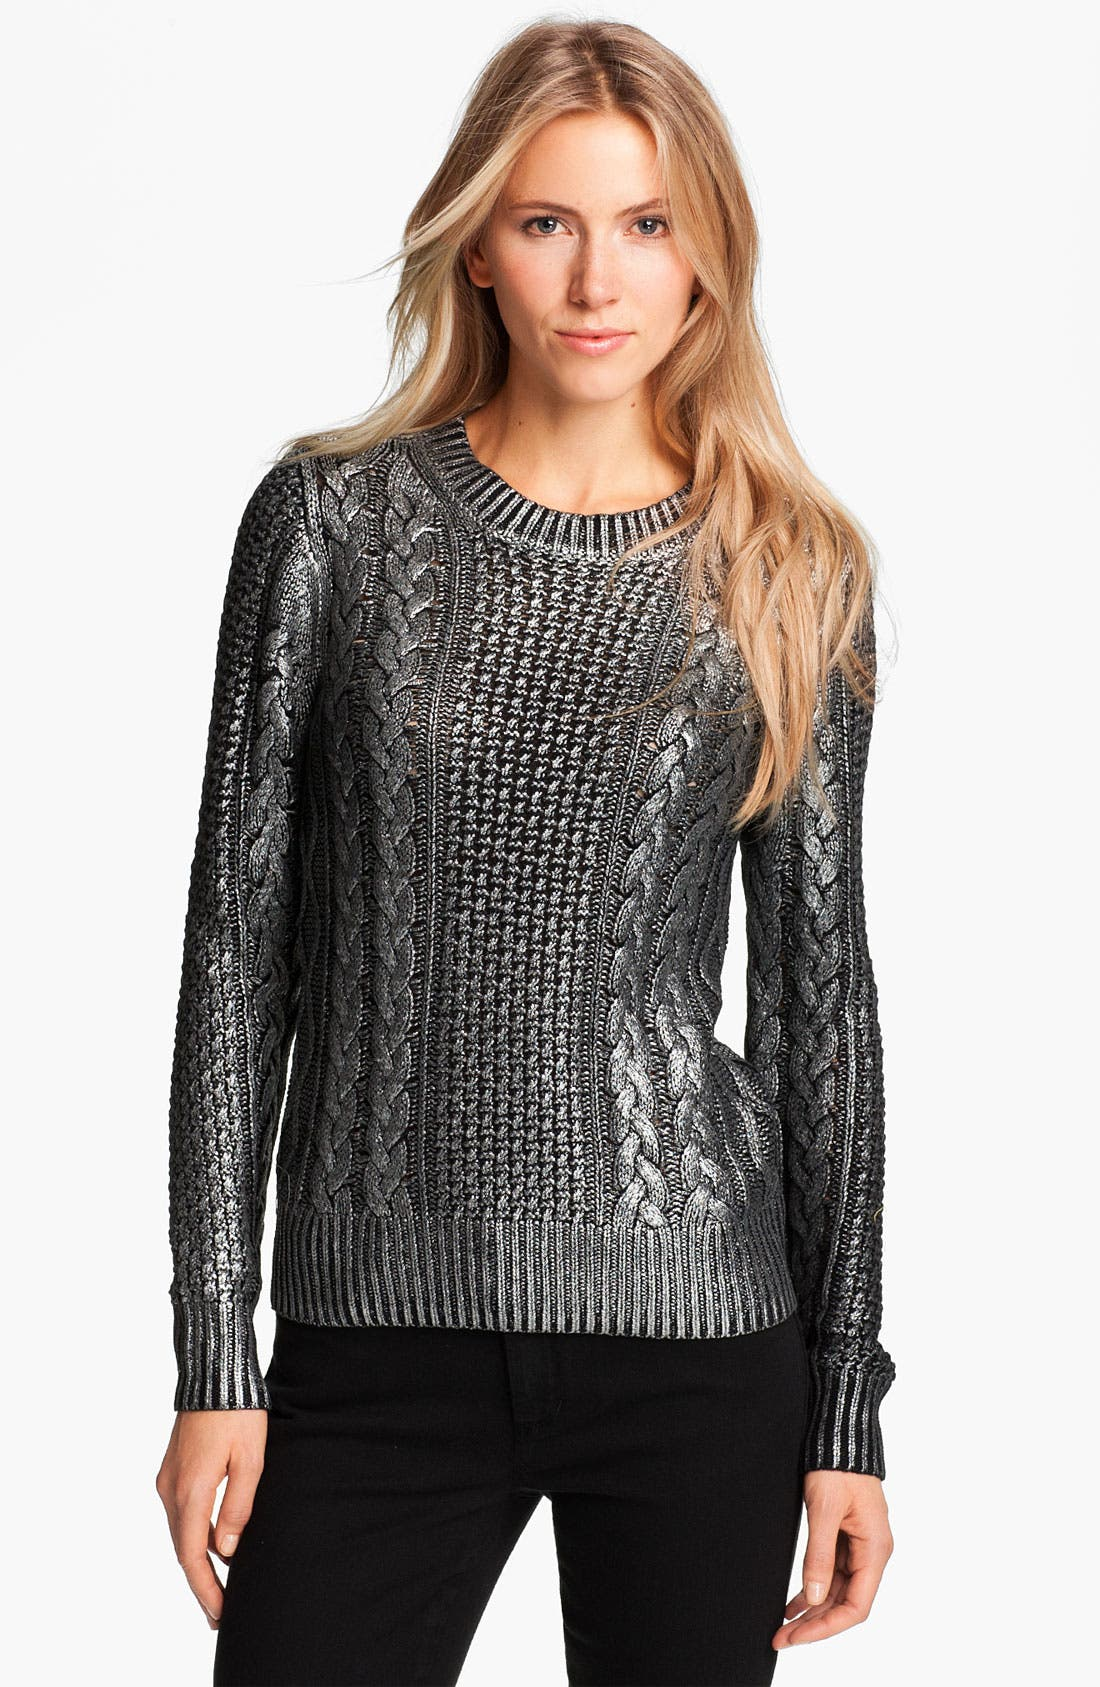 Alternate Image 1 Selected - MICHAEL Michael Kors Foiled Fisherman's Knit Sweater